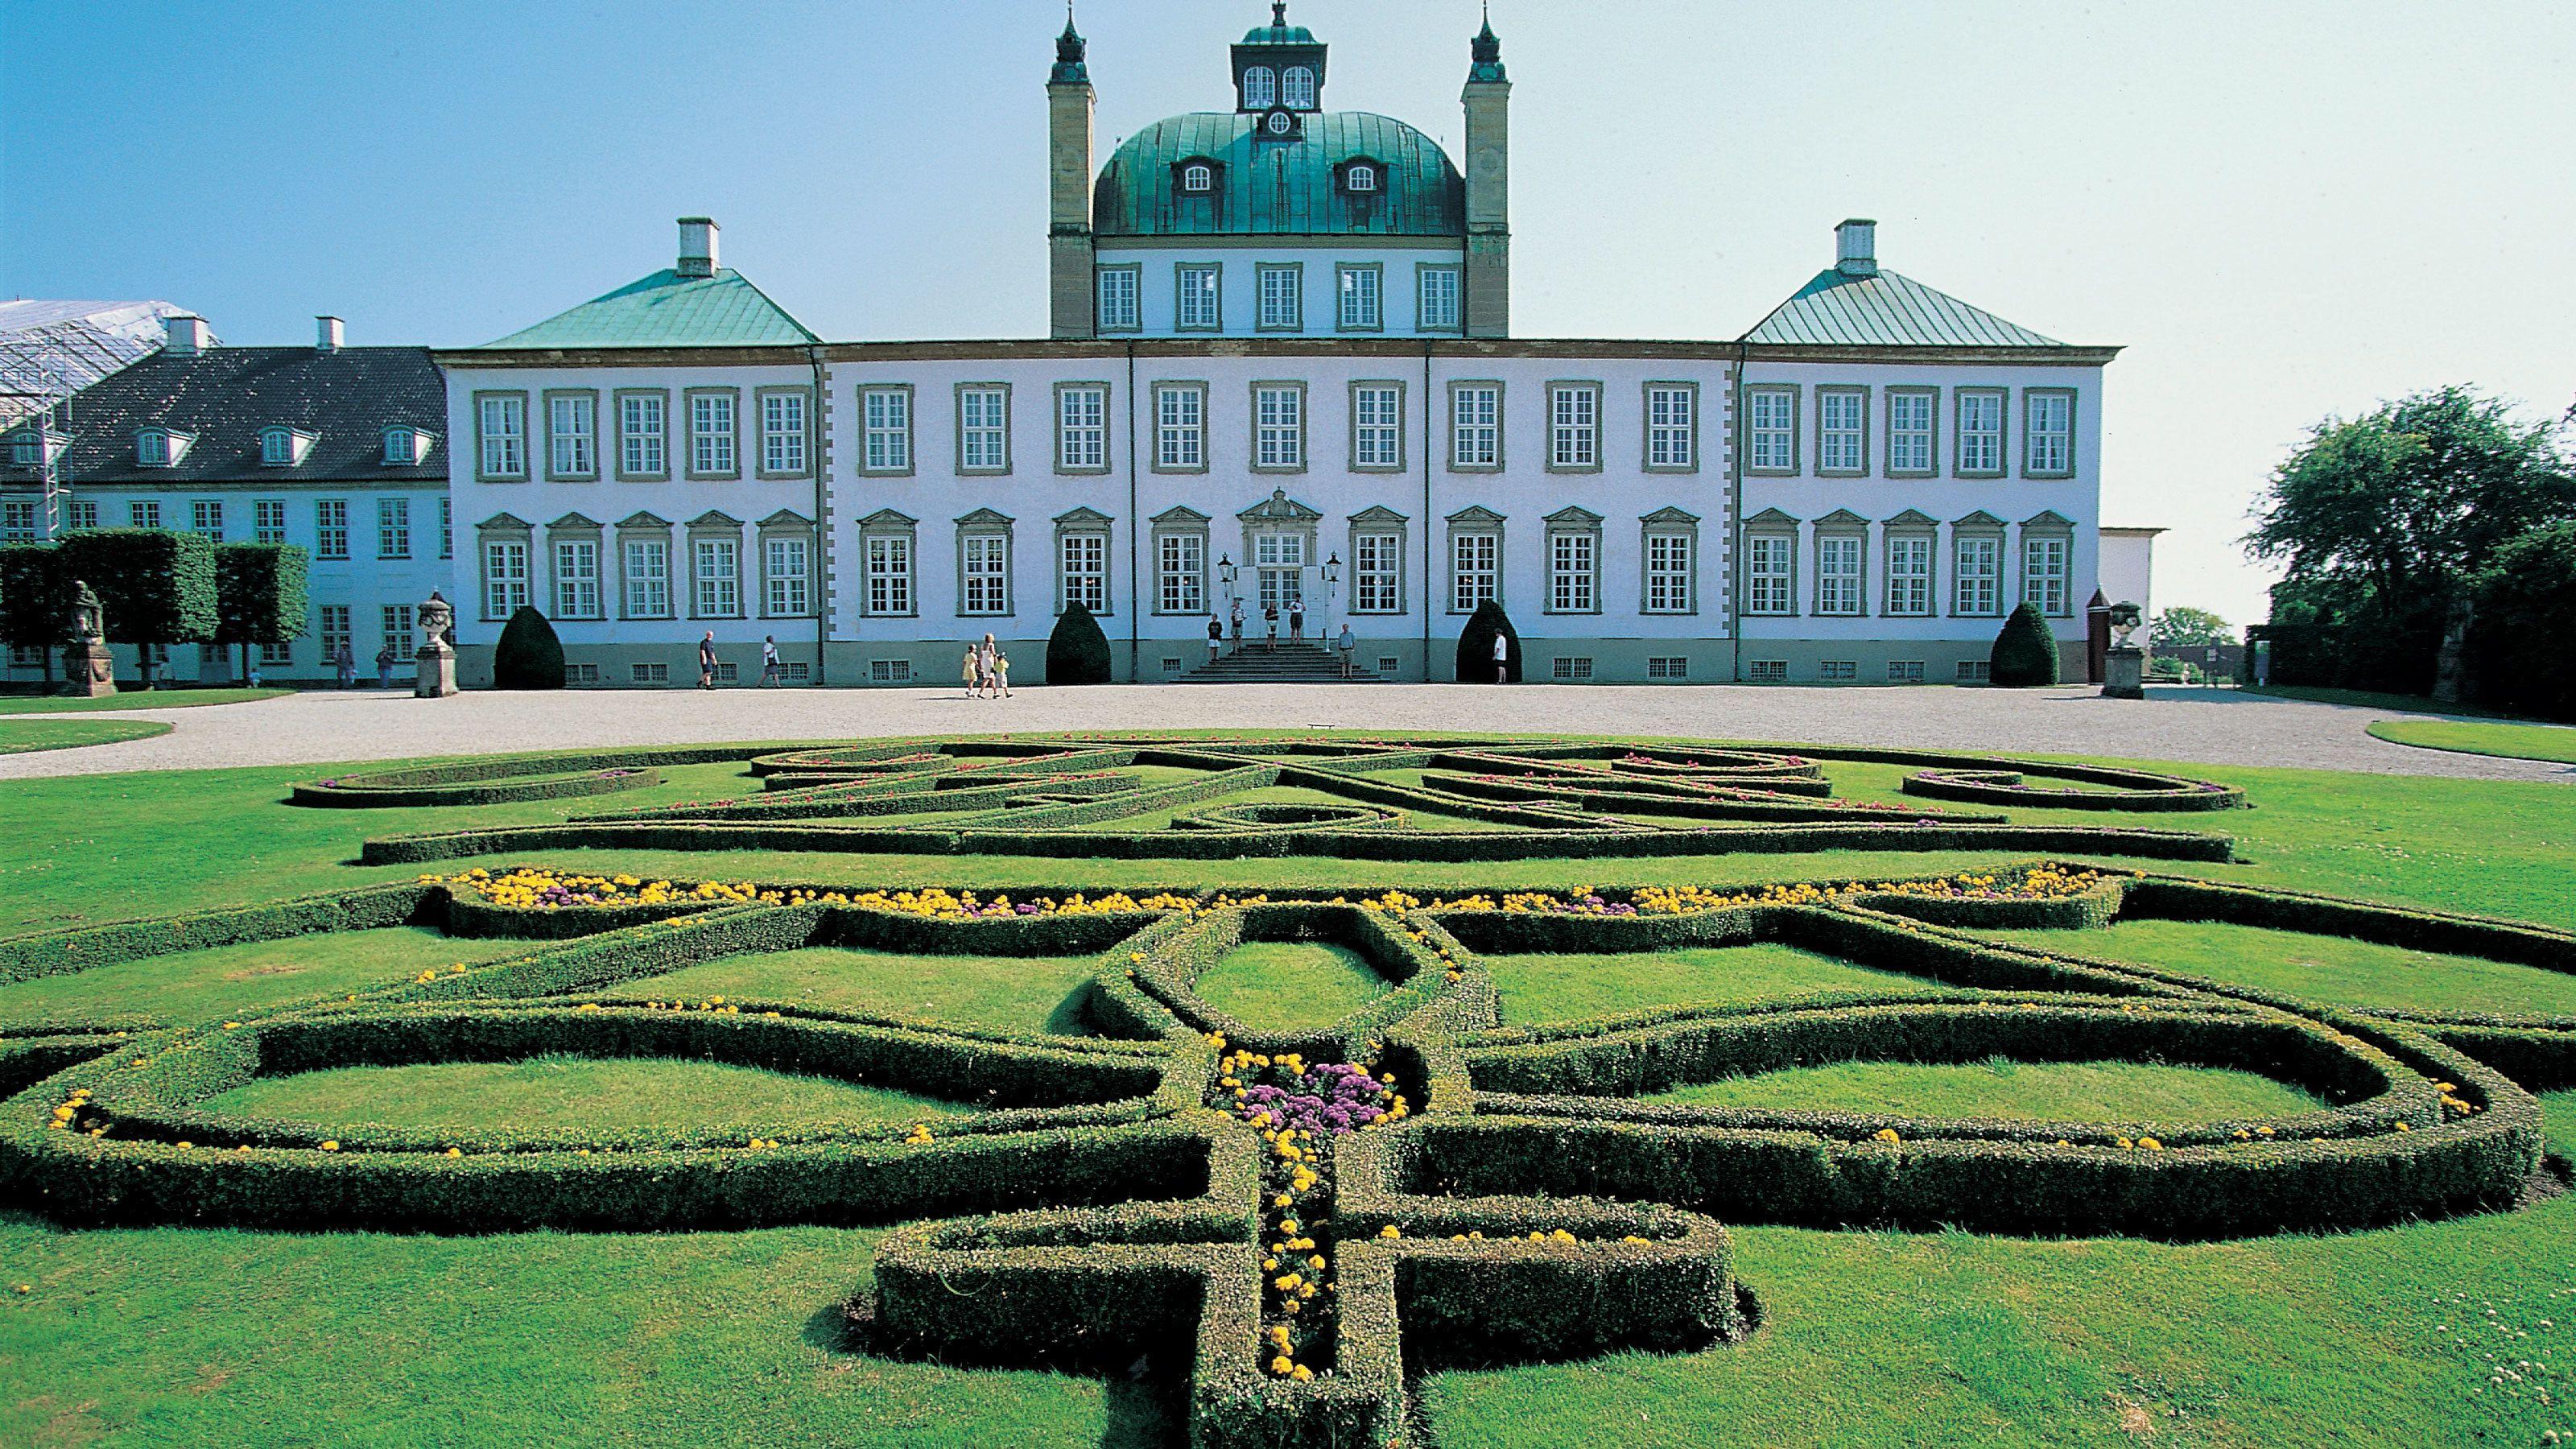 Cured garden outside of the palace in Copenhagen